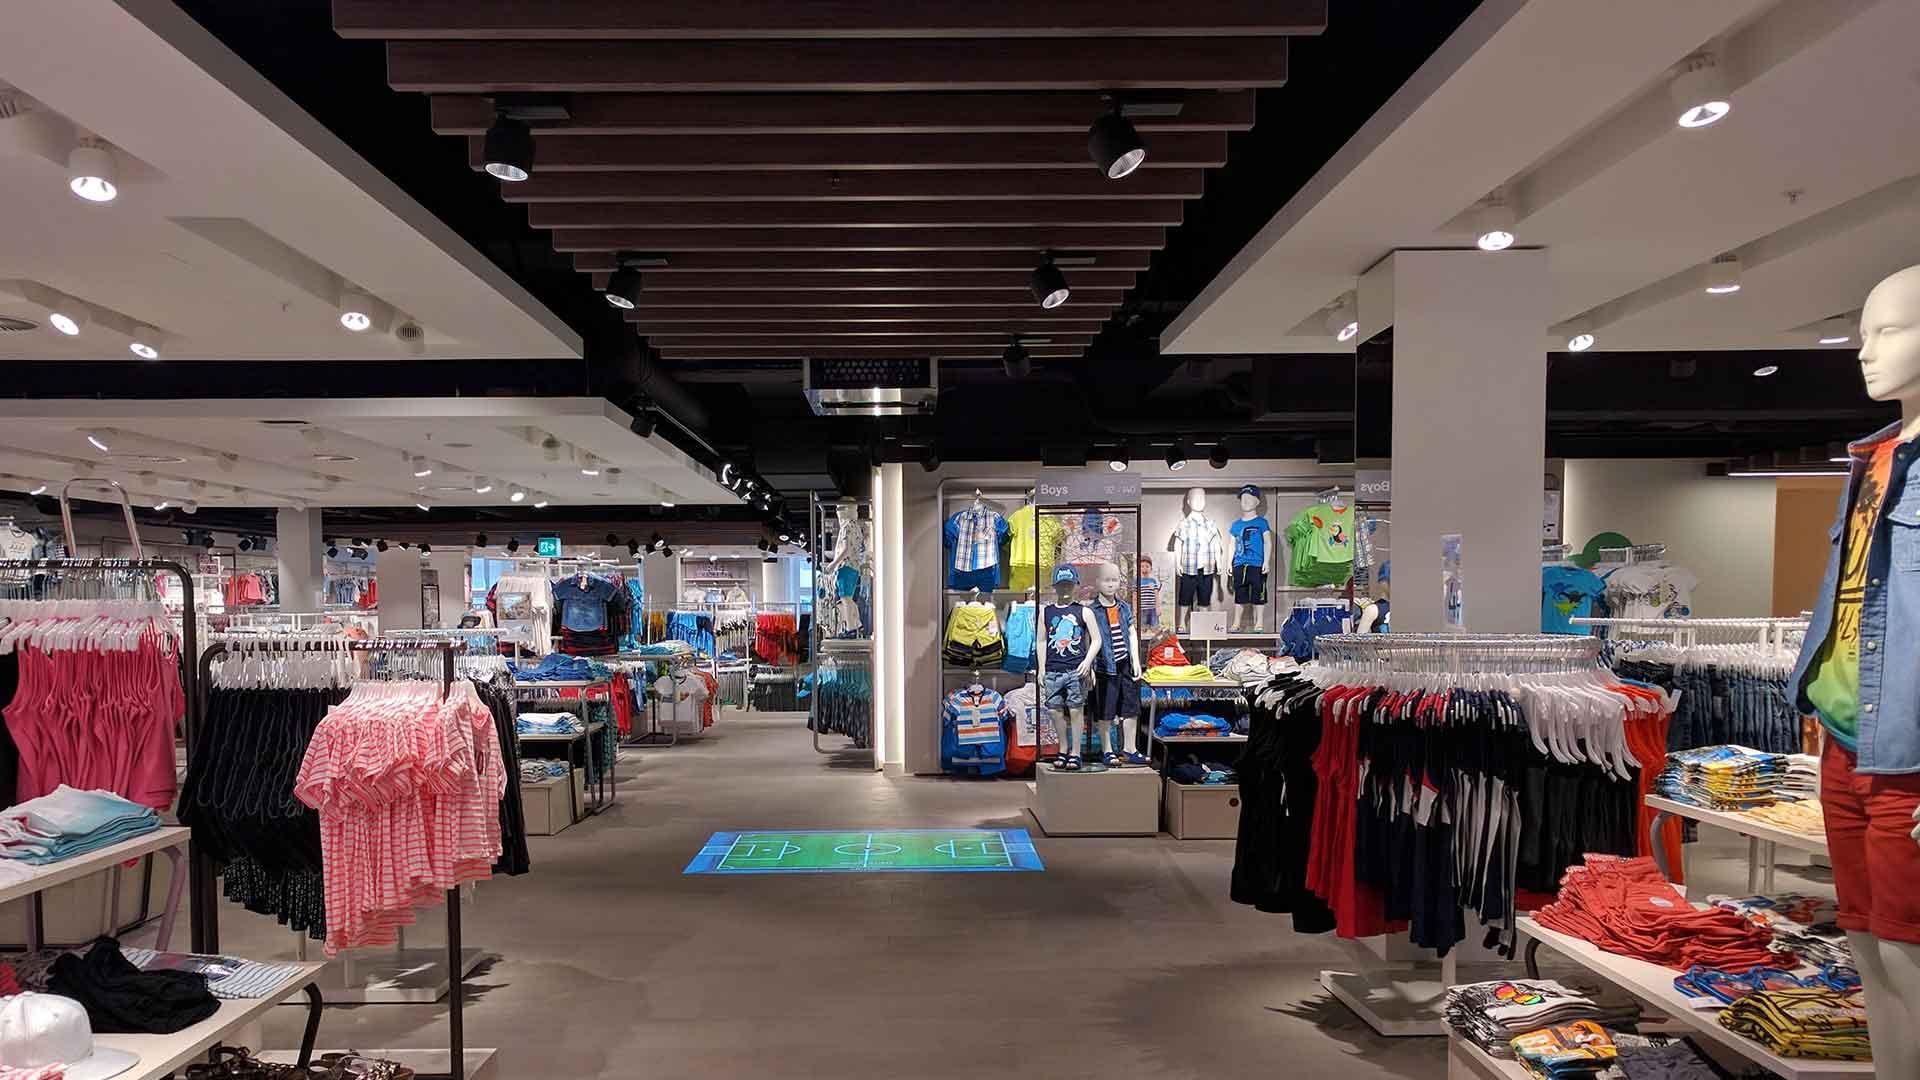 Retail Lighting Design Ceiling Strategy Wooden Slats White Raft Detail Merchandise Nulty